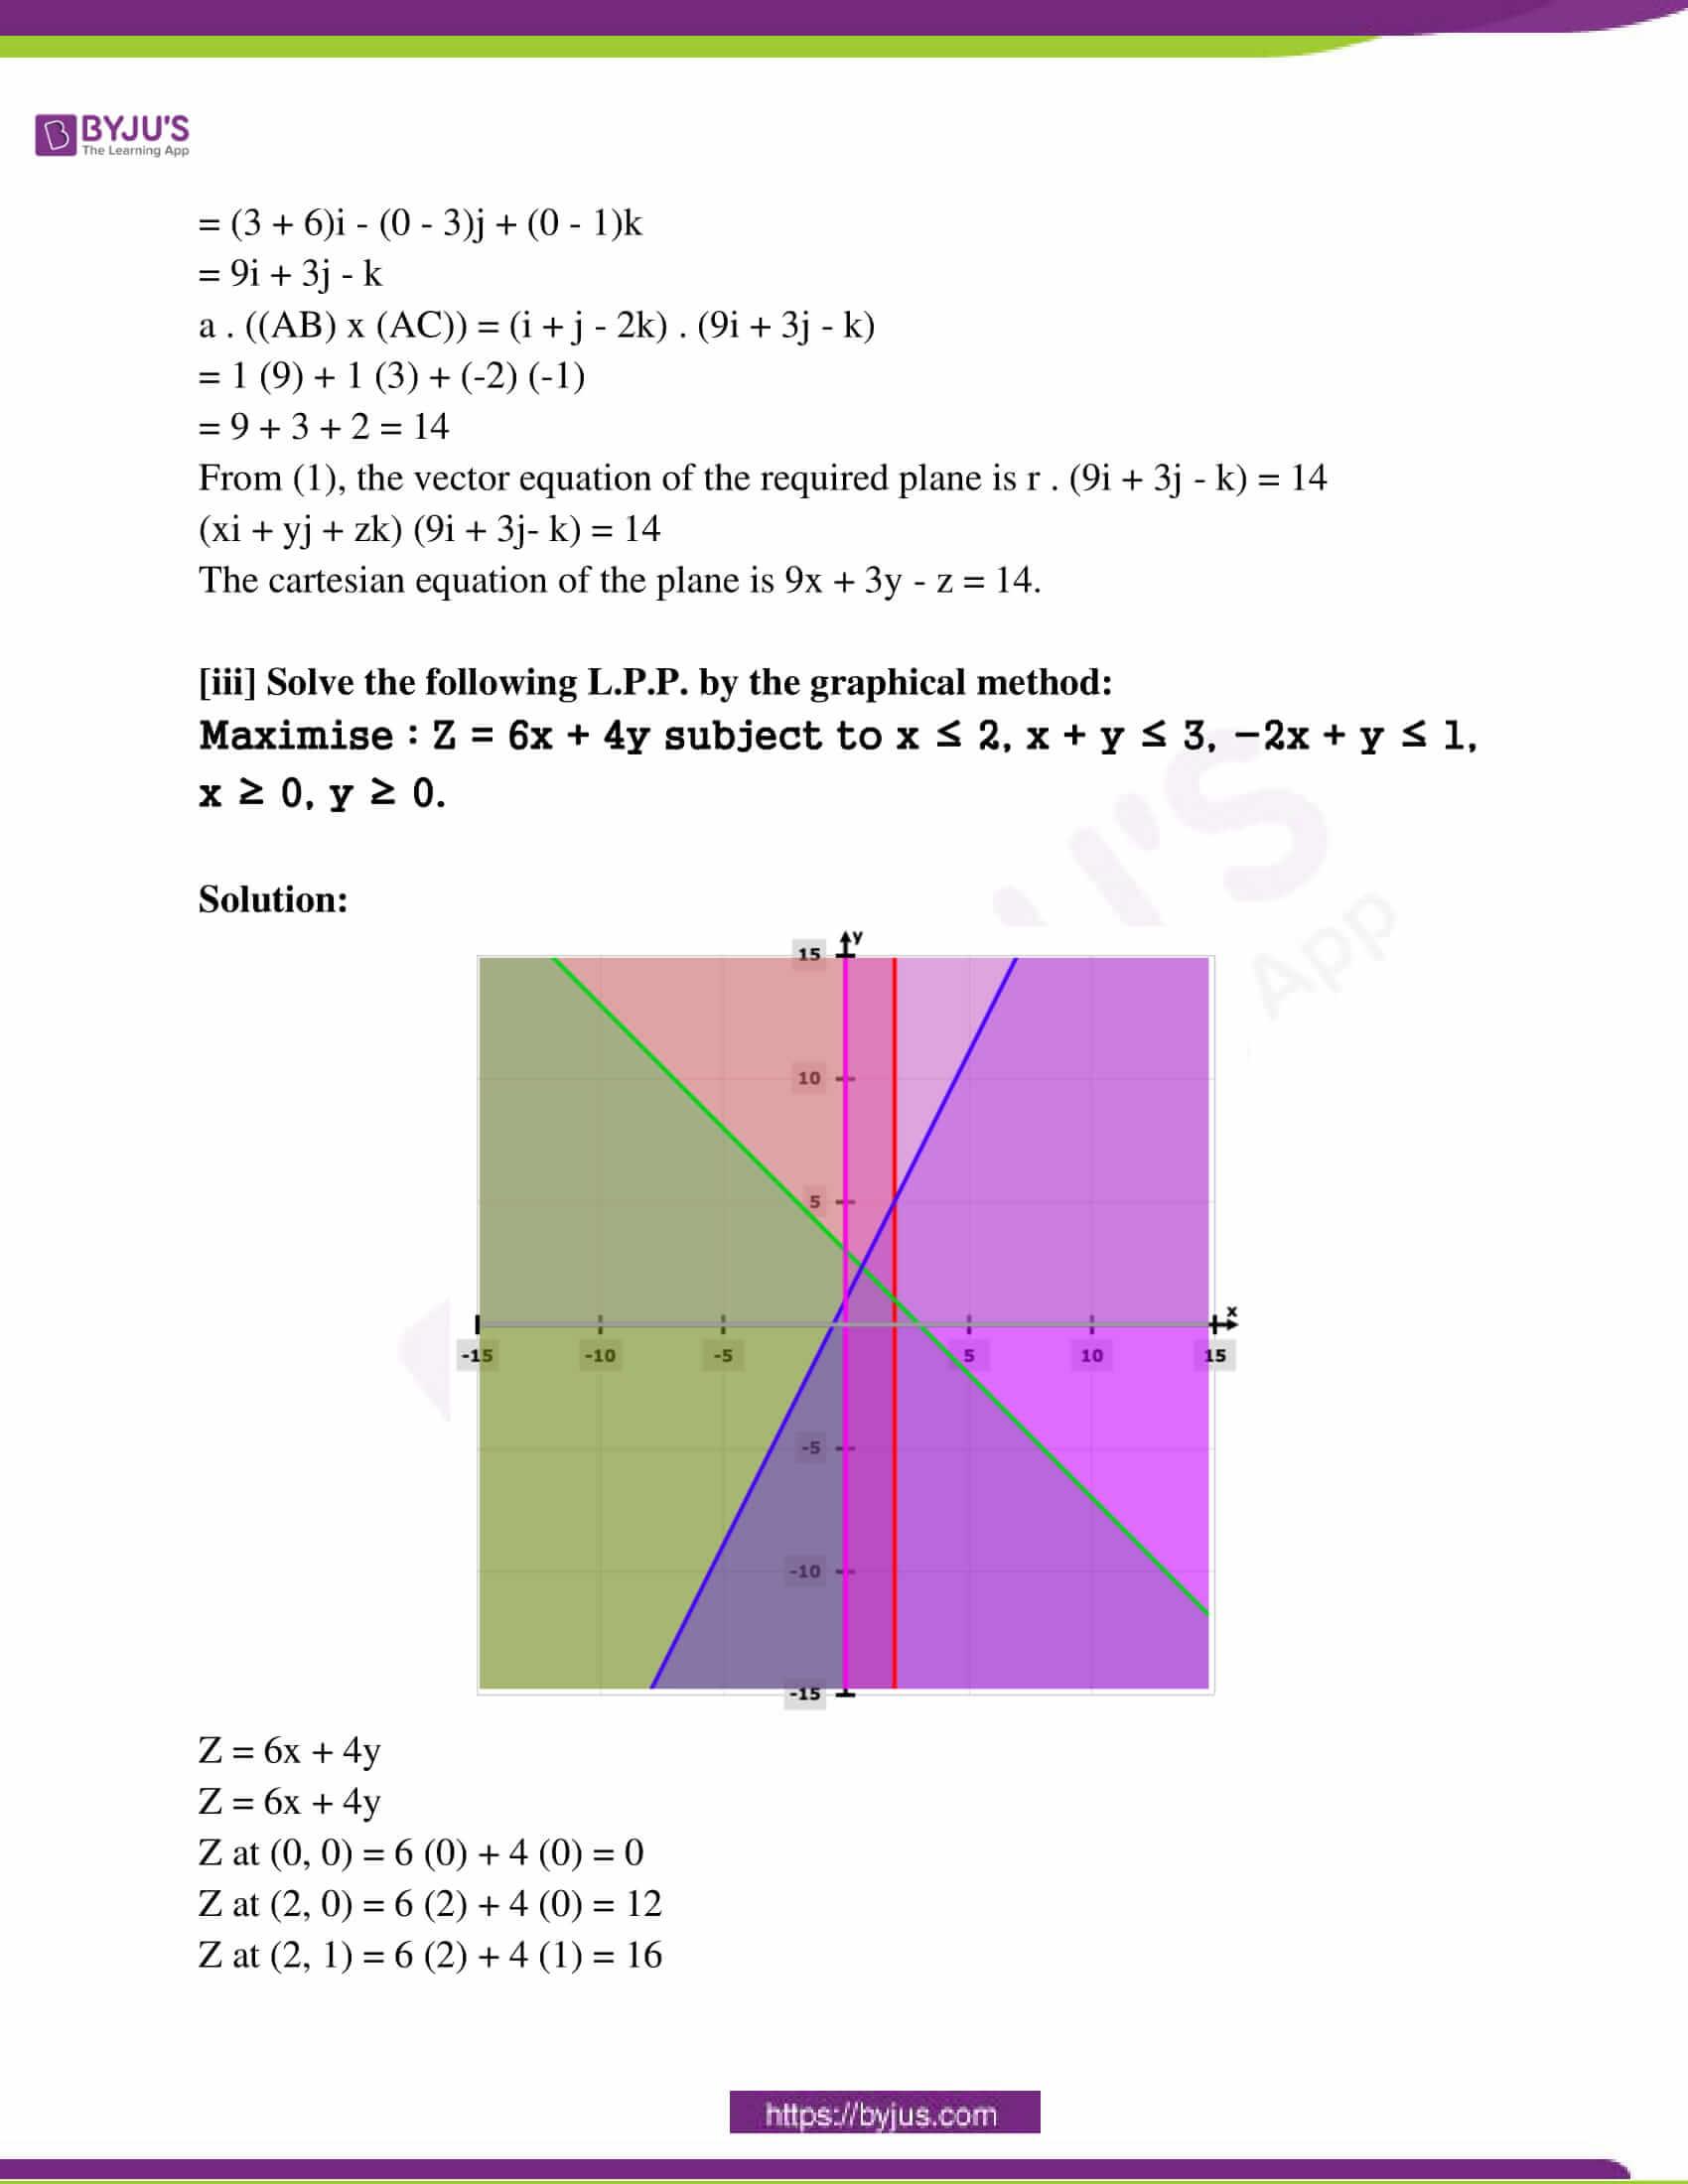 maharashtra class 12 exam question paper solutions march 2017 14